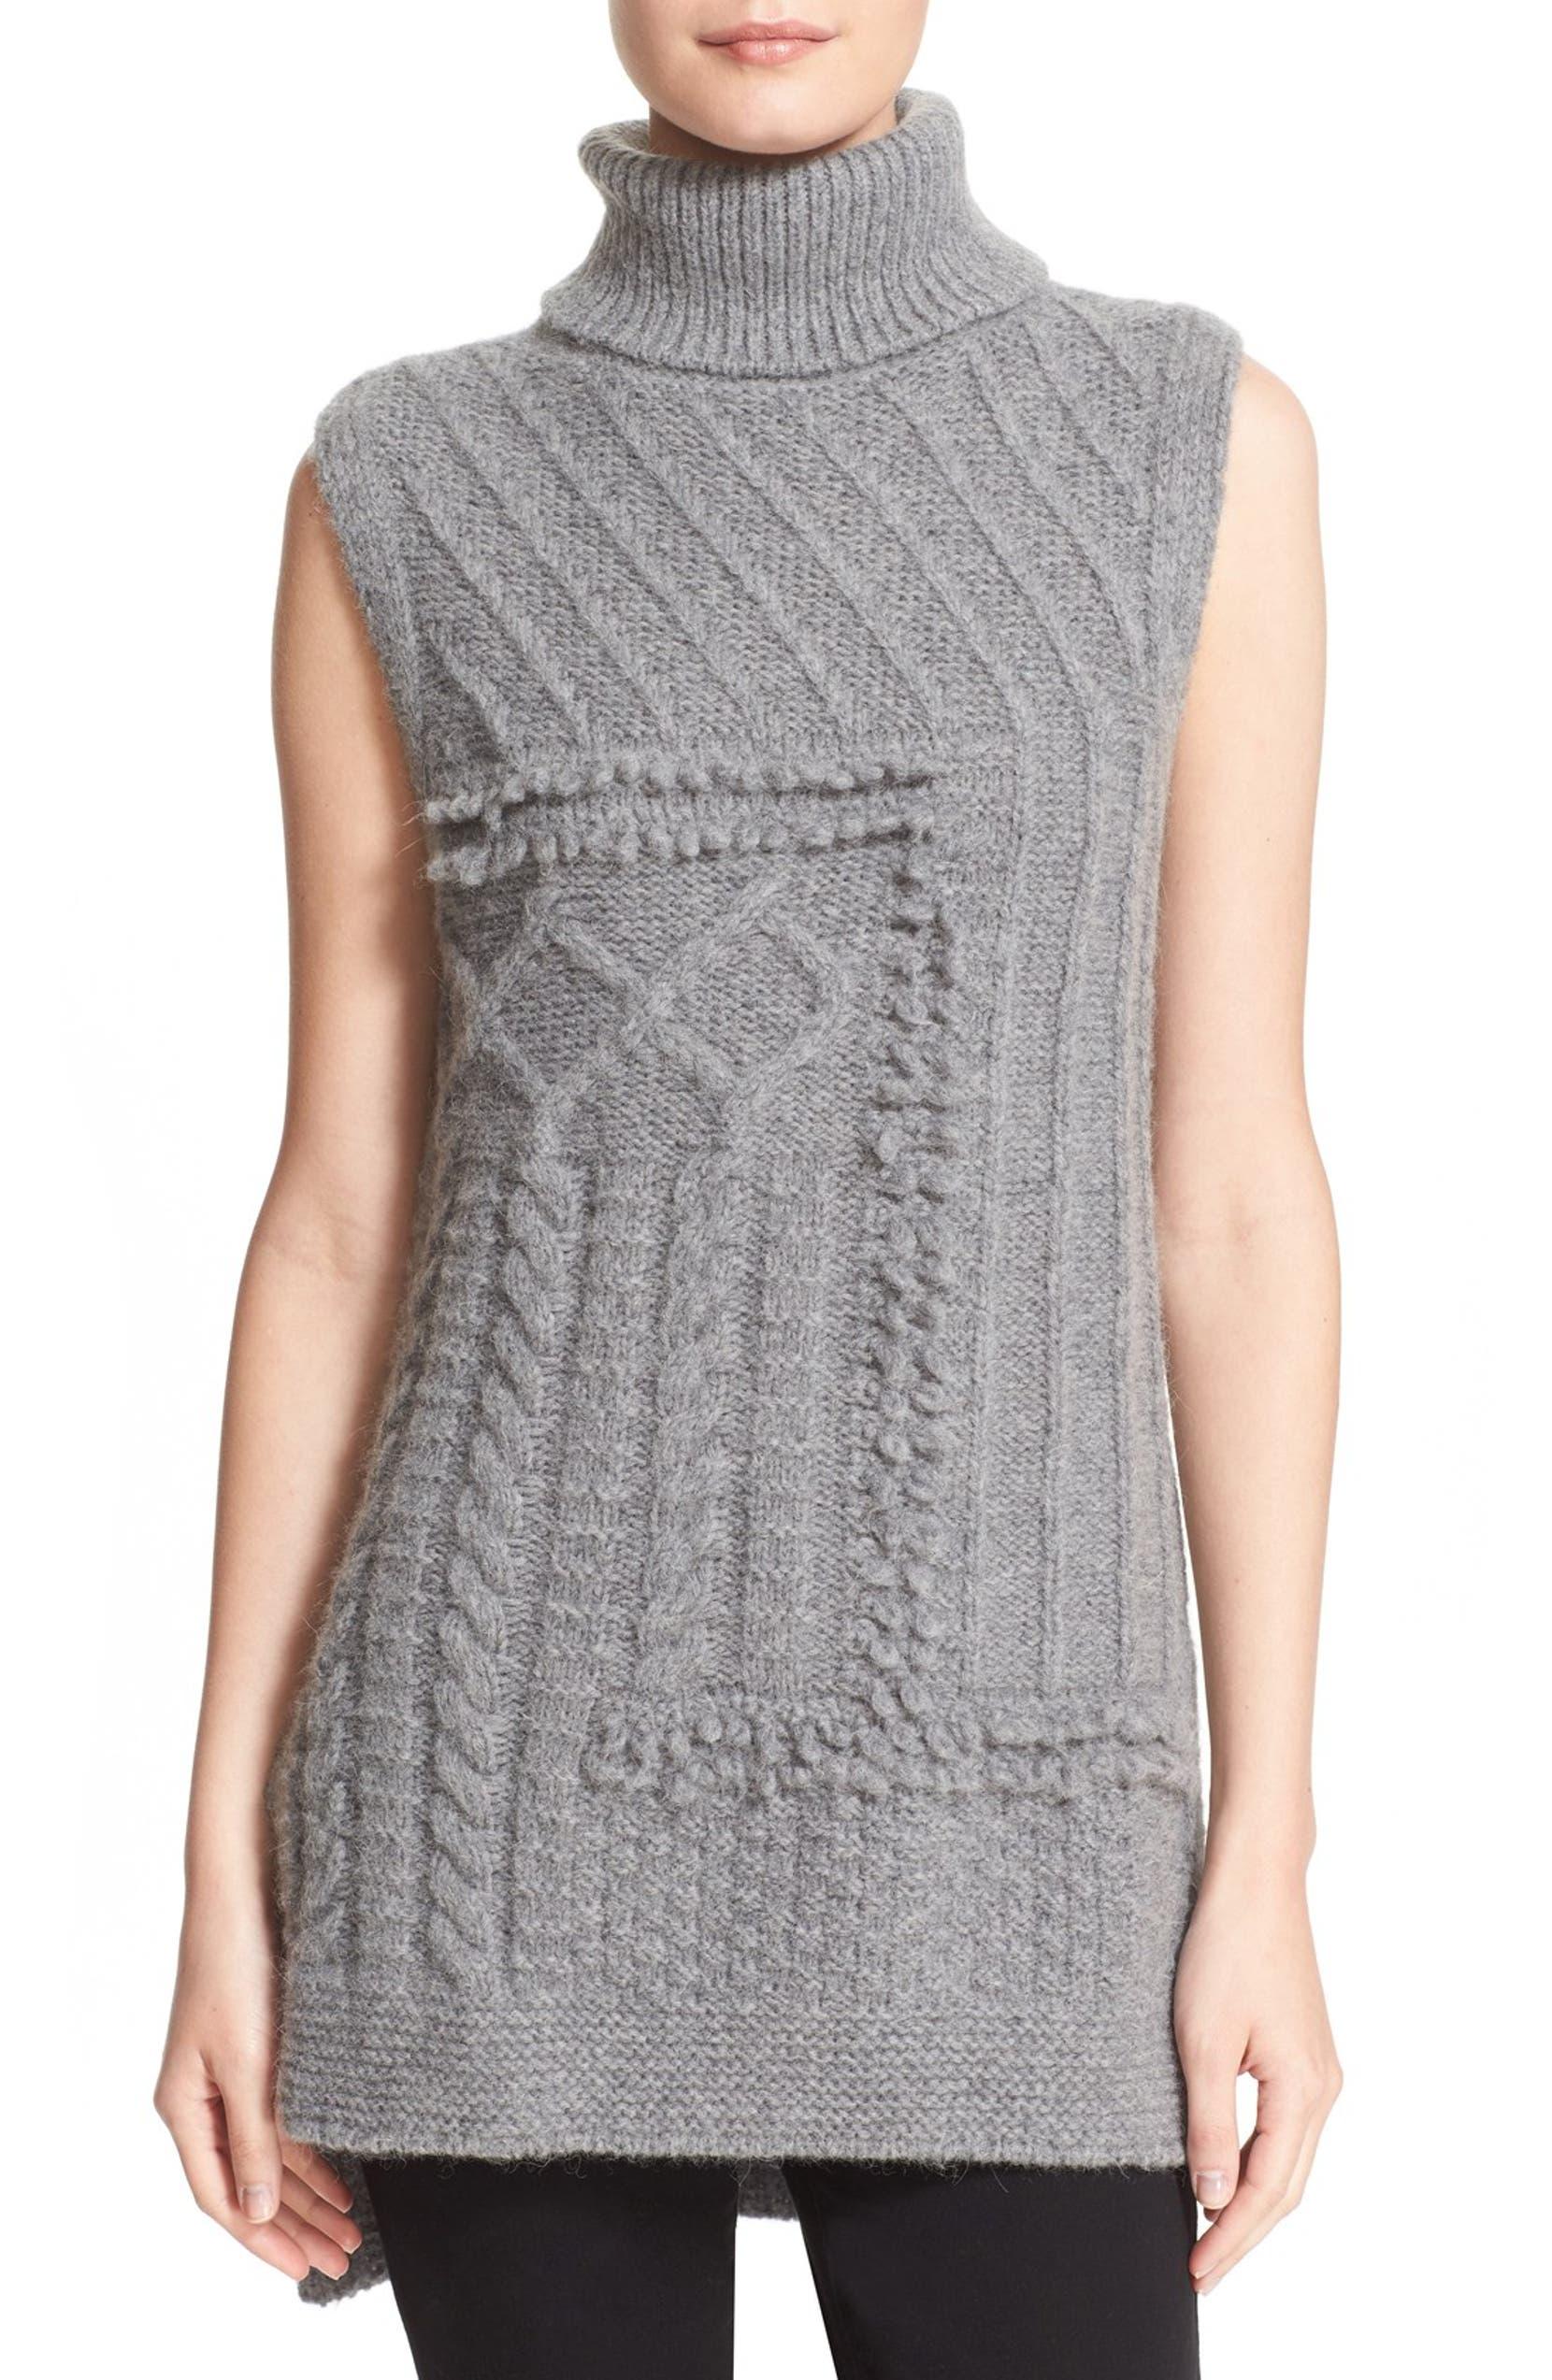 269f15c47aa6b Derek Lam 10 Crosby Cable Knit Turtleneck Sweater Vest